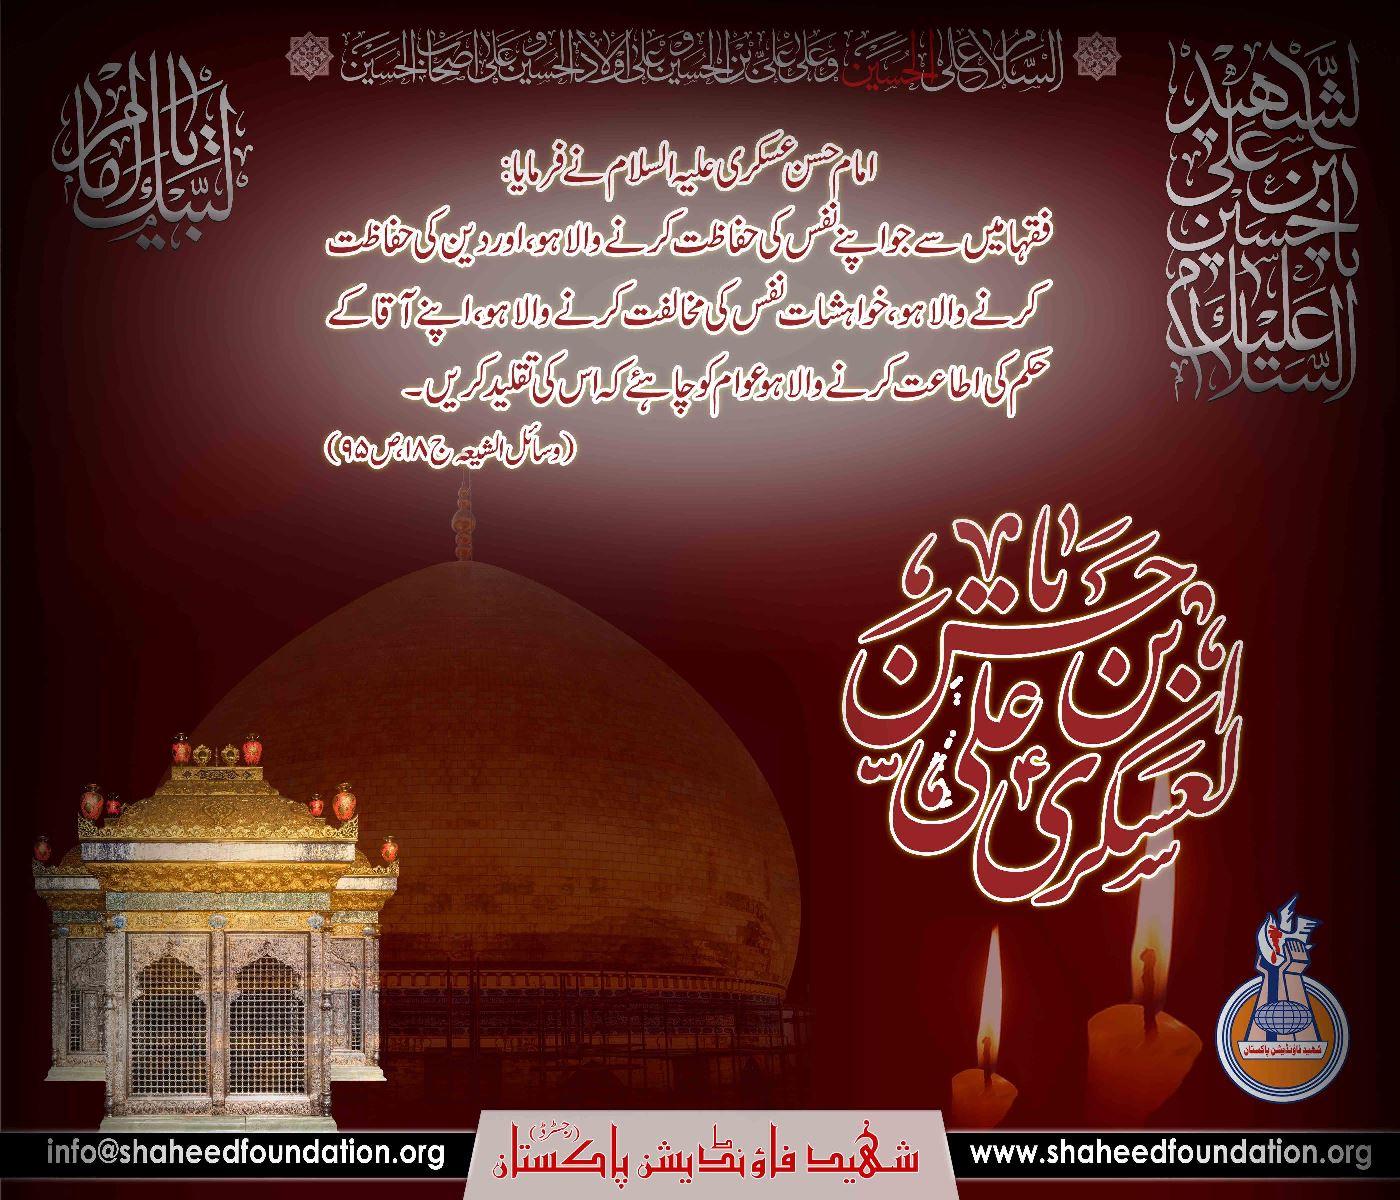 8th Rabiul-Awal: Shahadat Anniversary of Imam Hasan Askari (AS)